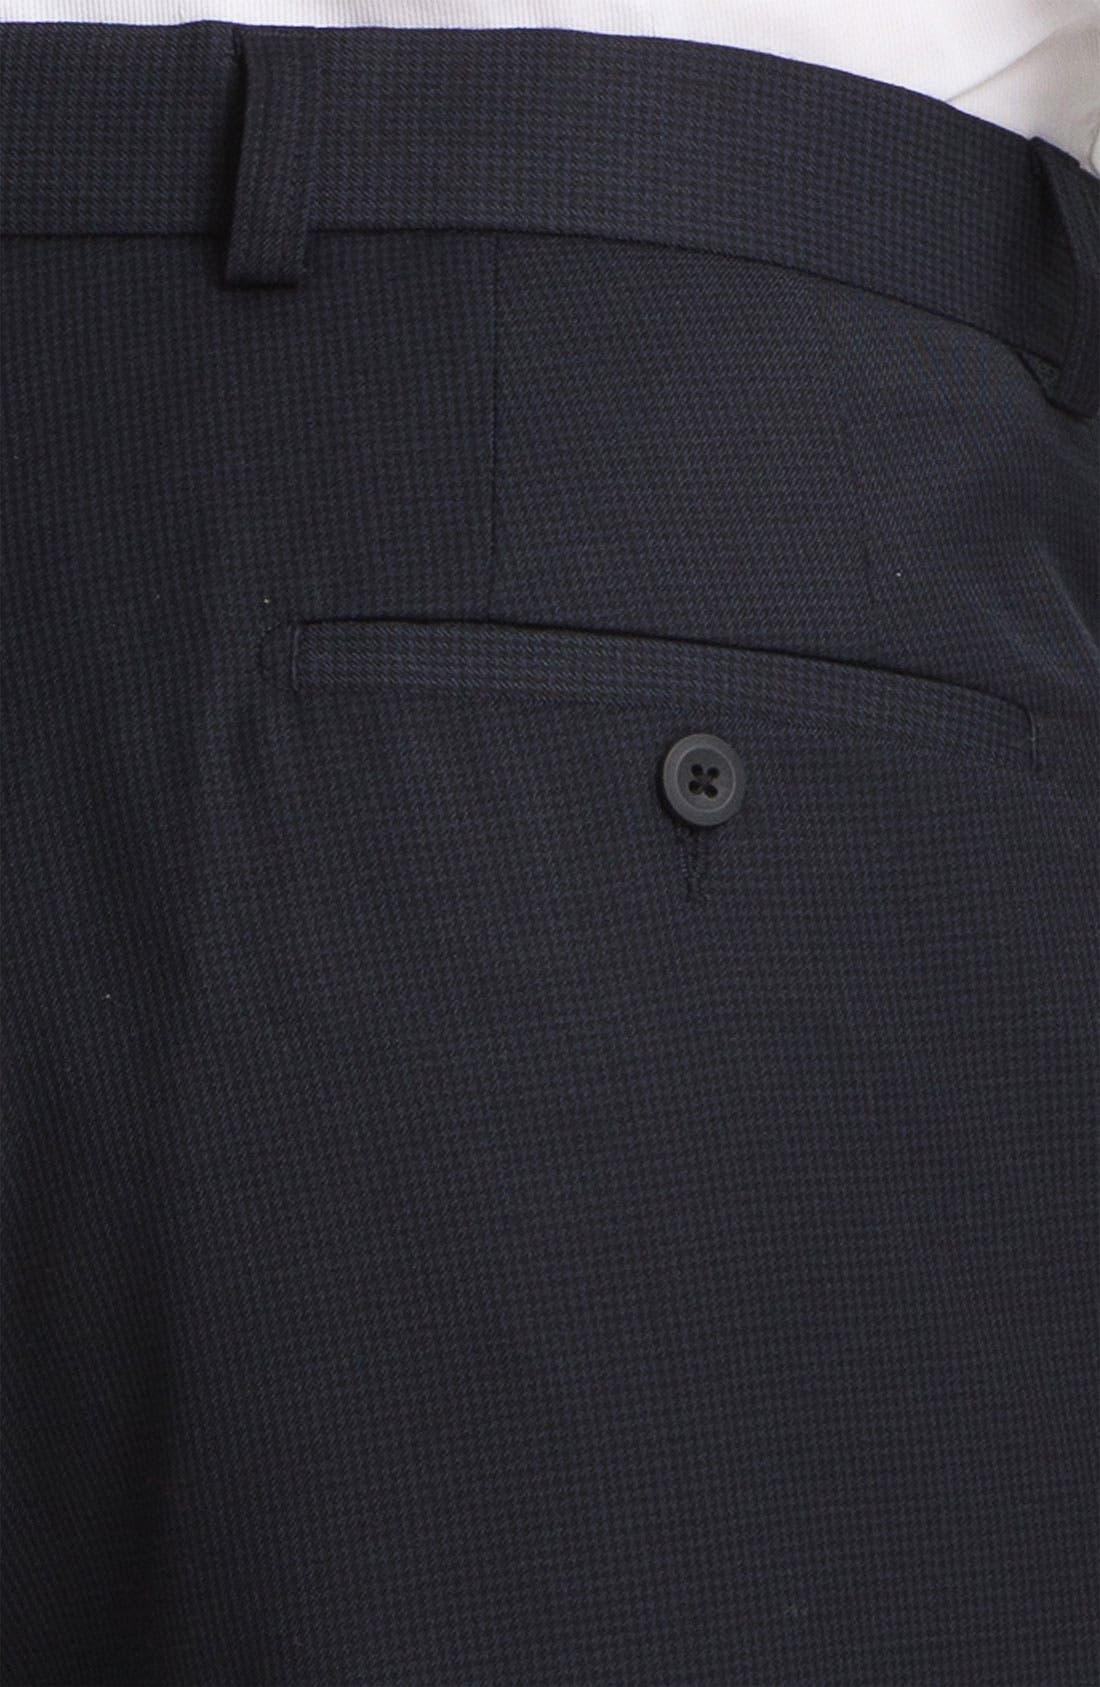 Alternate Image 3  - Linea Naturale 'Fancy' Flat Front Microfiber Trousers